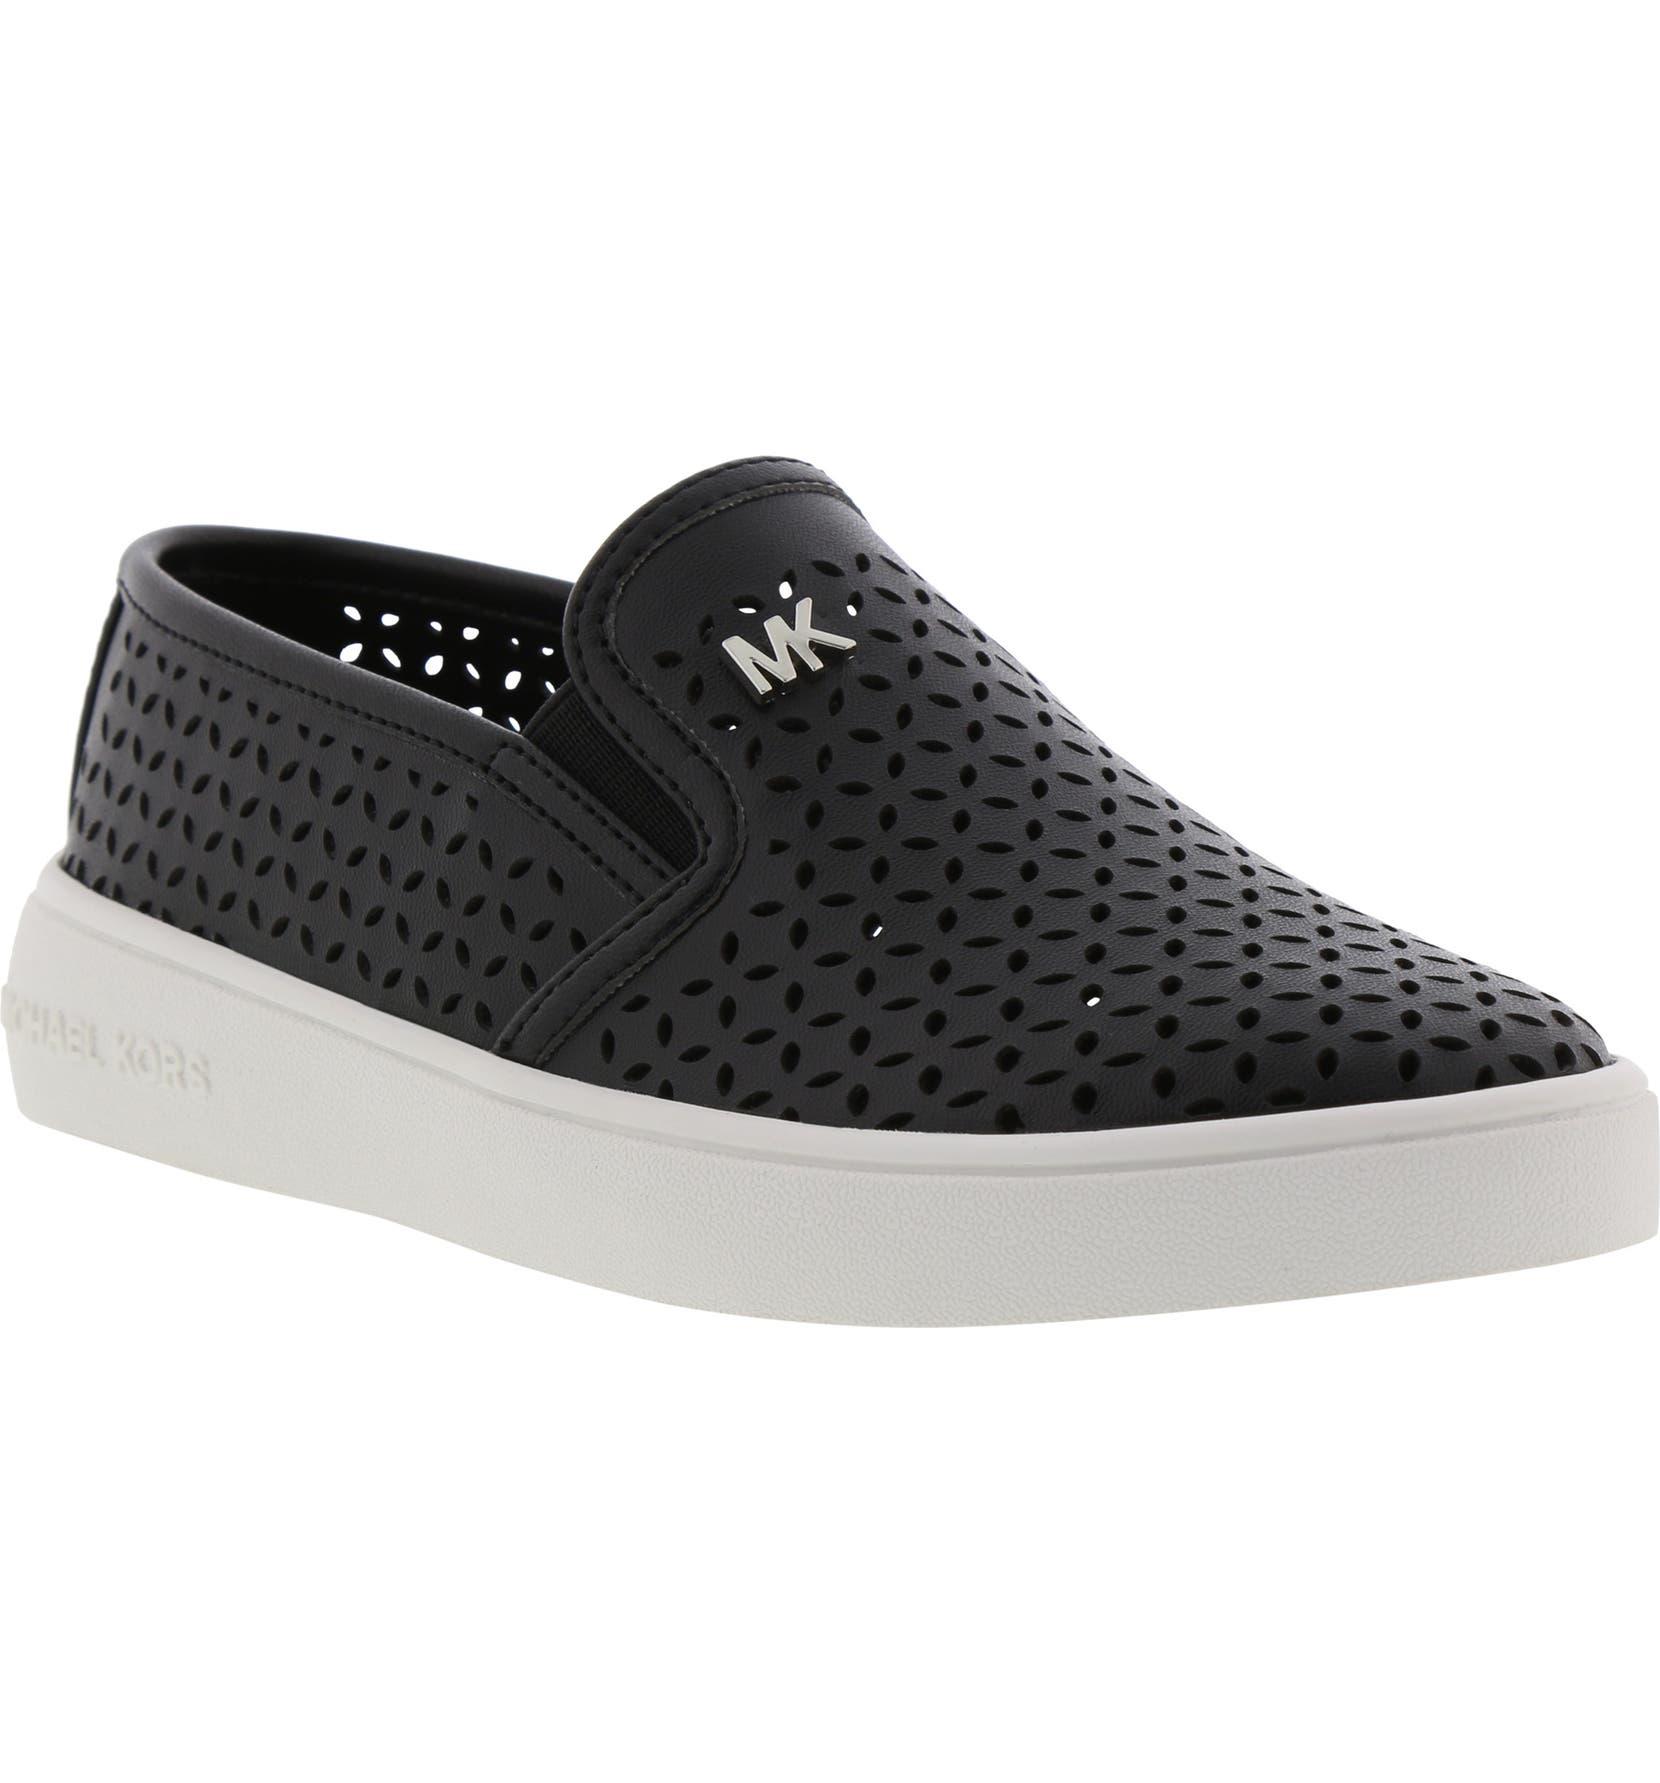 611c049d MICHAEL Michael Kors Jem Olivia Perforated Slip-On Sneaker (Walker,  Toddler, Little Kid & Big Kid) | Nordstrom